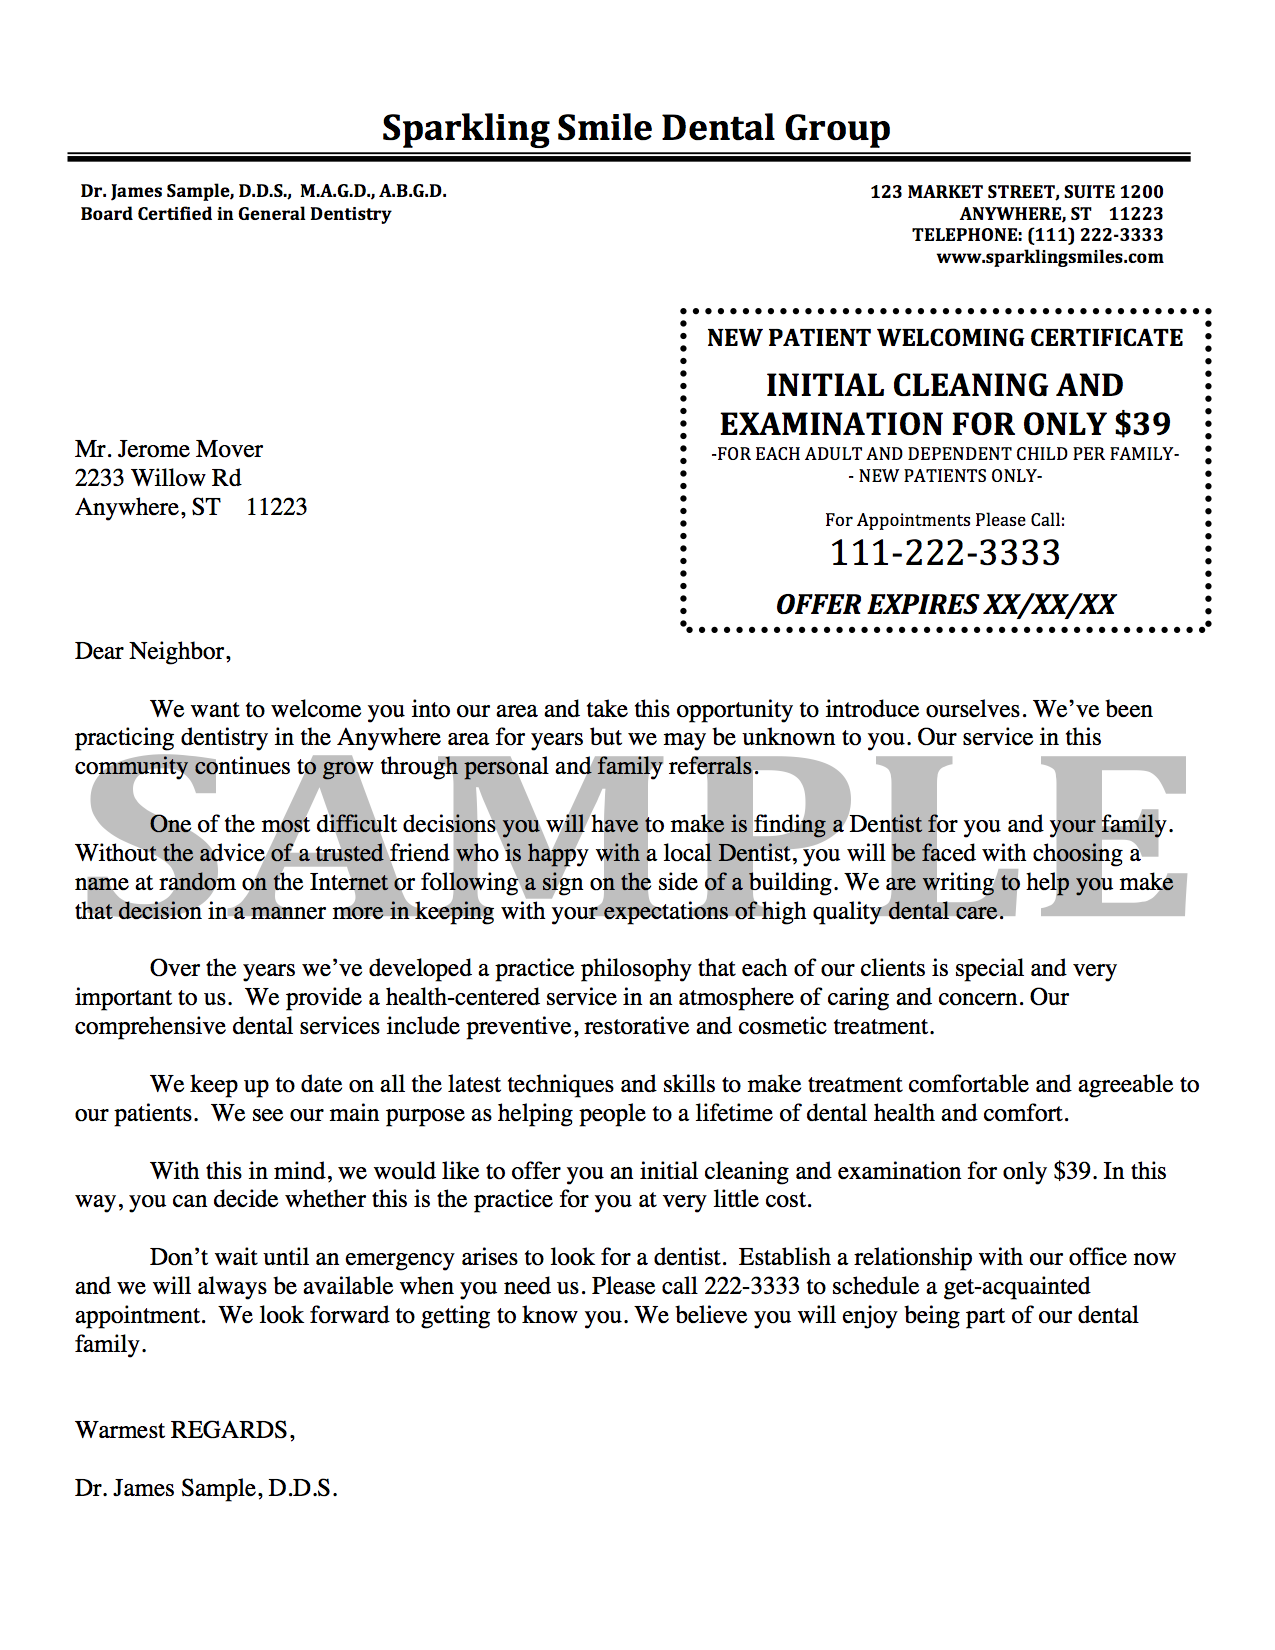 vendor certification letter appointment letter sample download format word appointment letter sample download citehr dealer certification